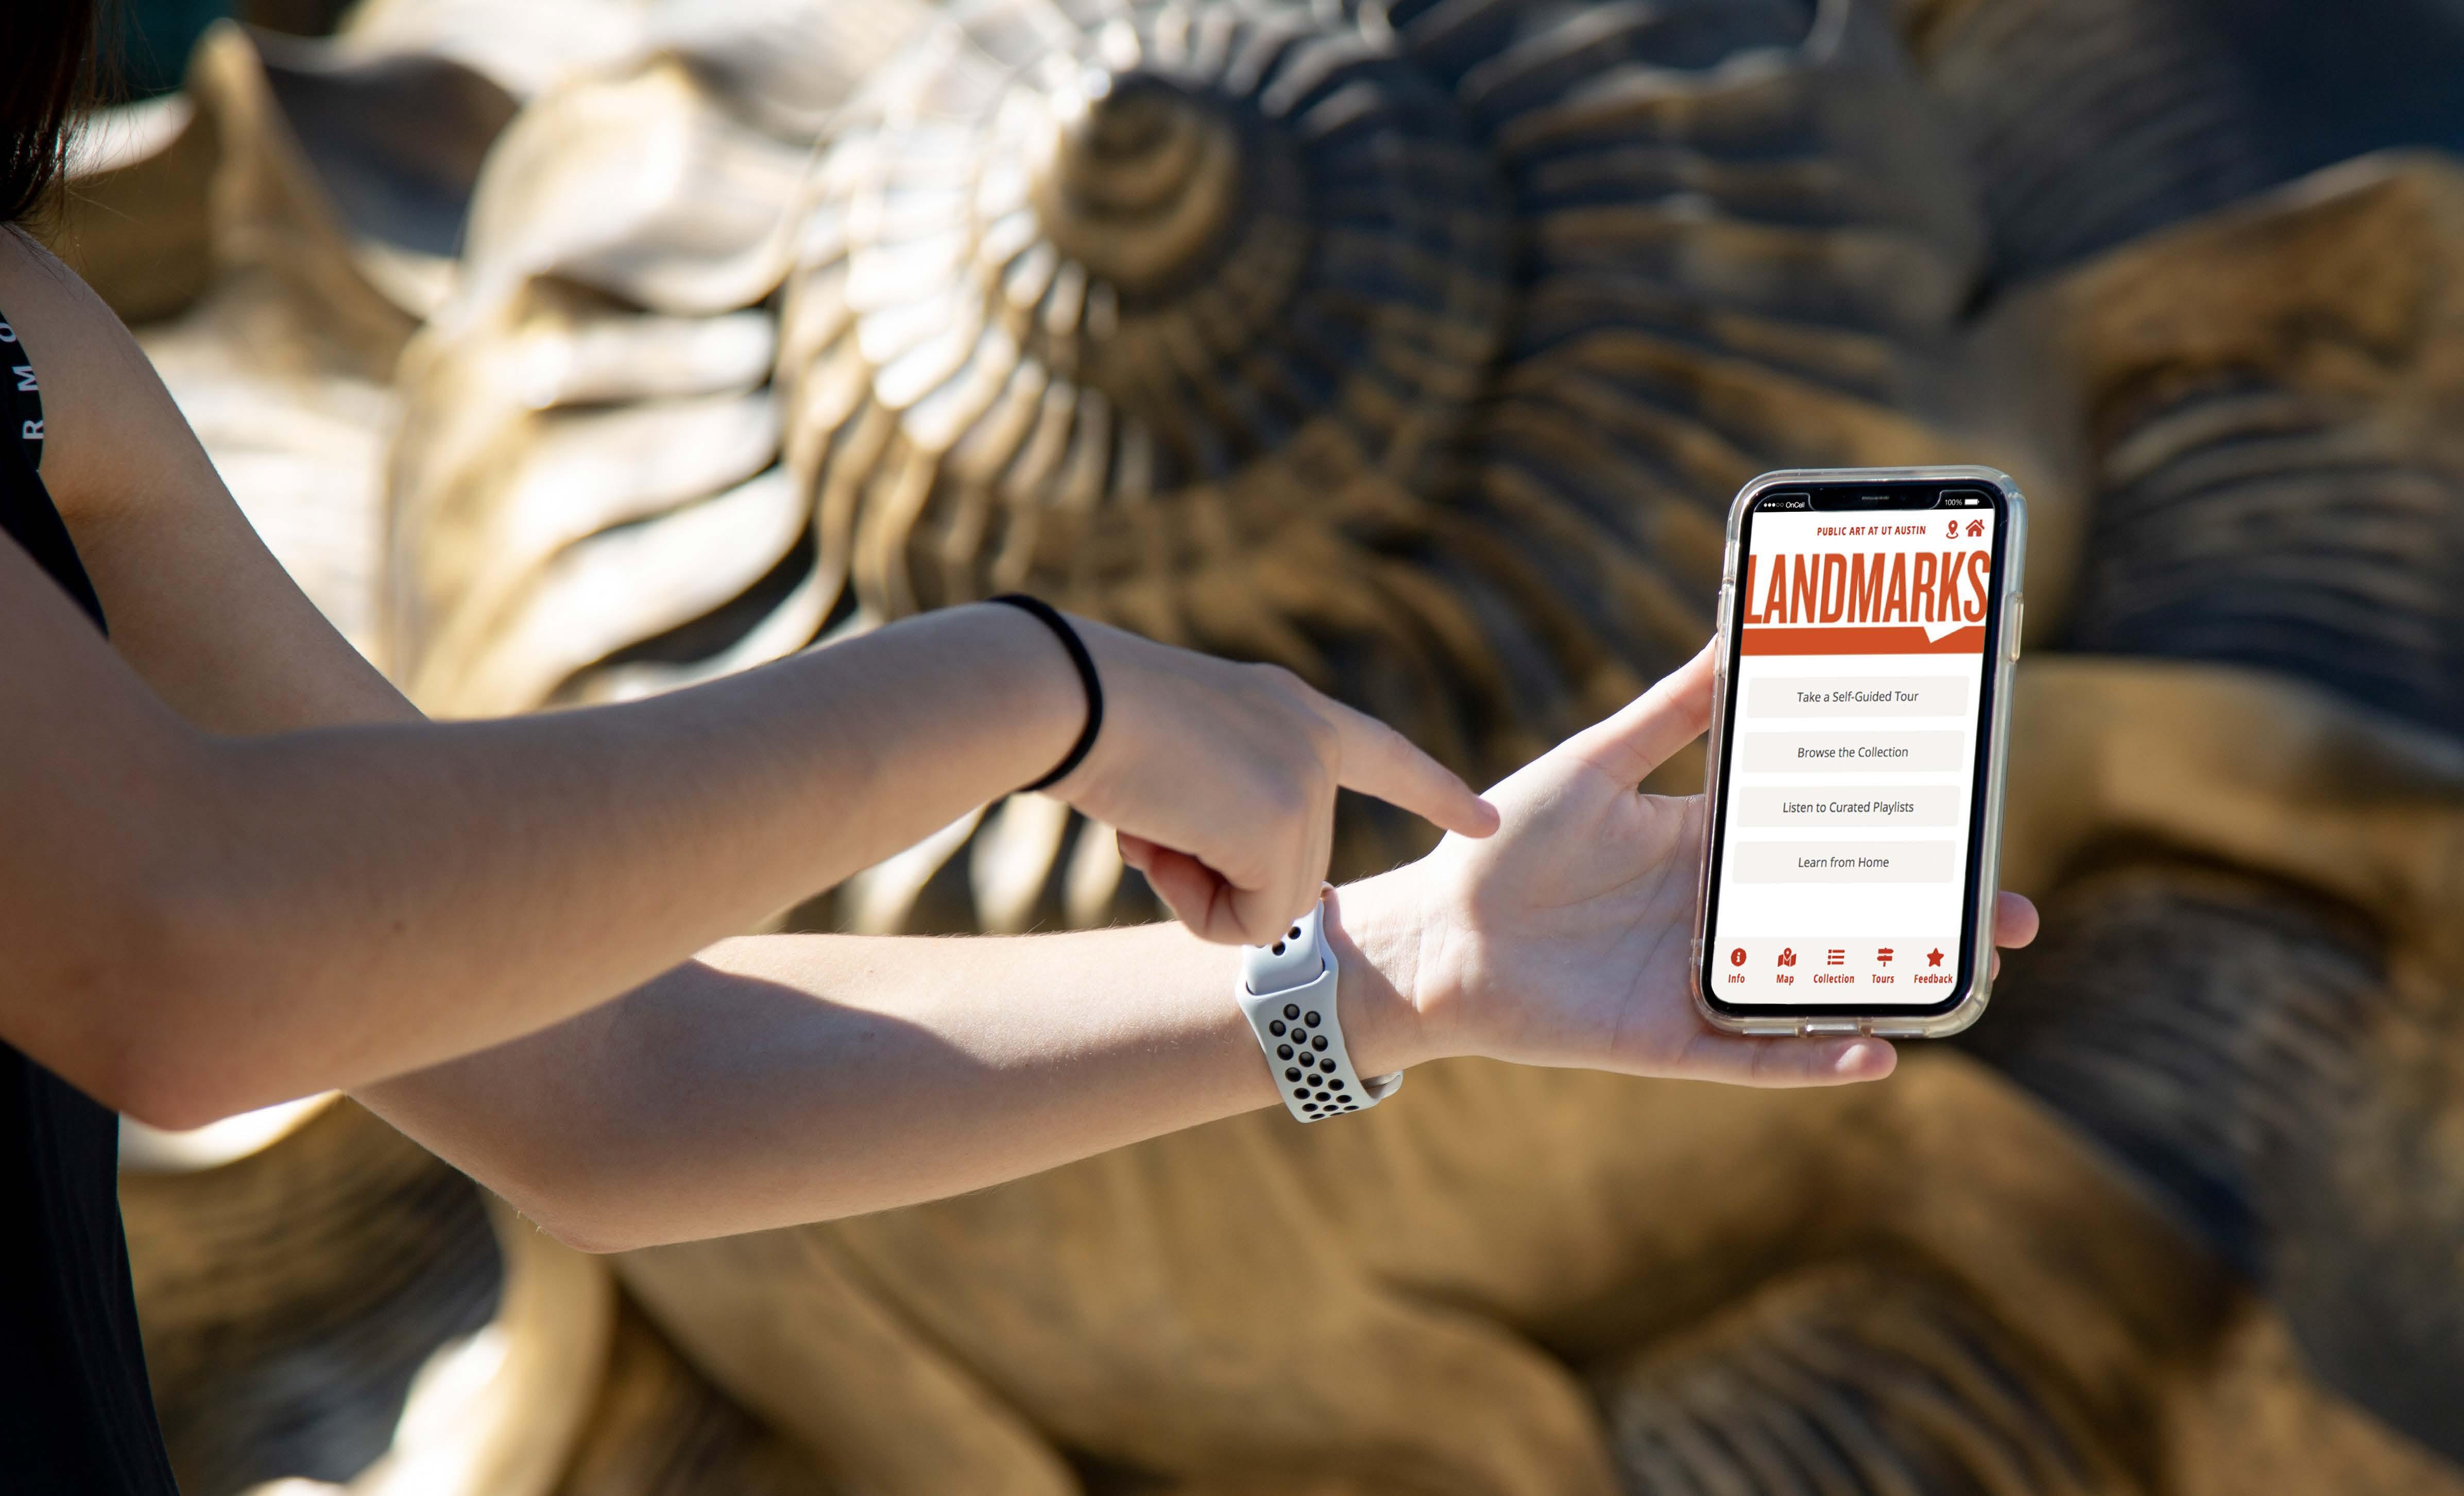 University of Texas Landmarks - Represents appmockup homepagetout v3